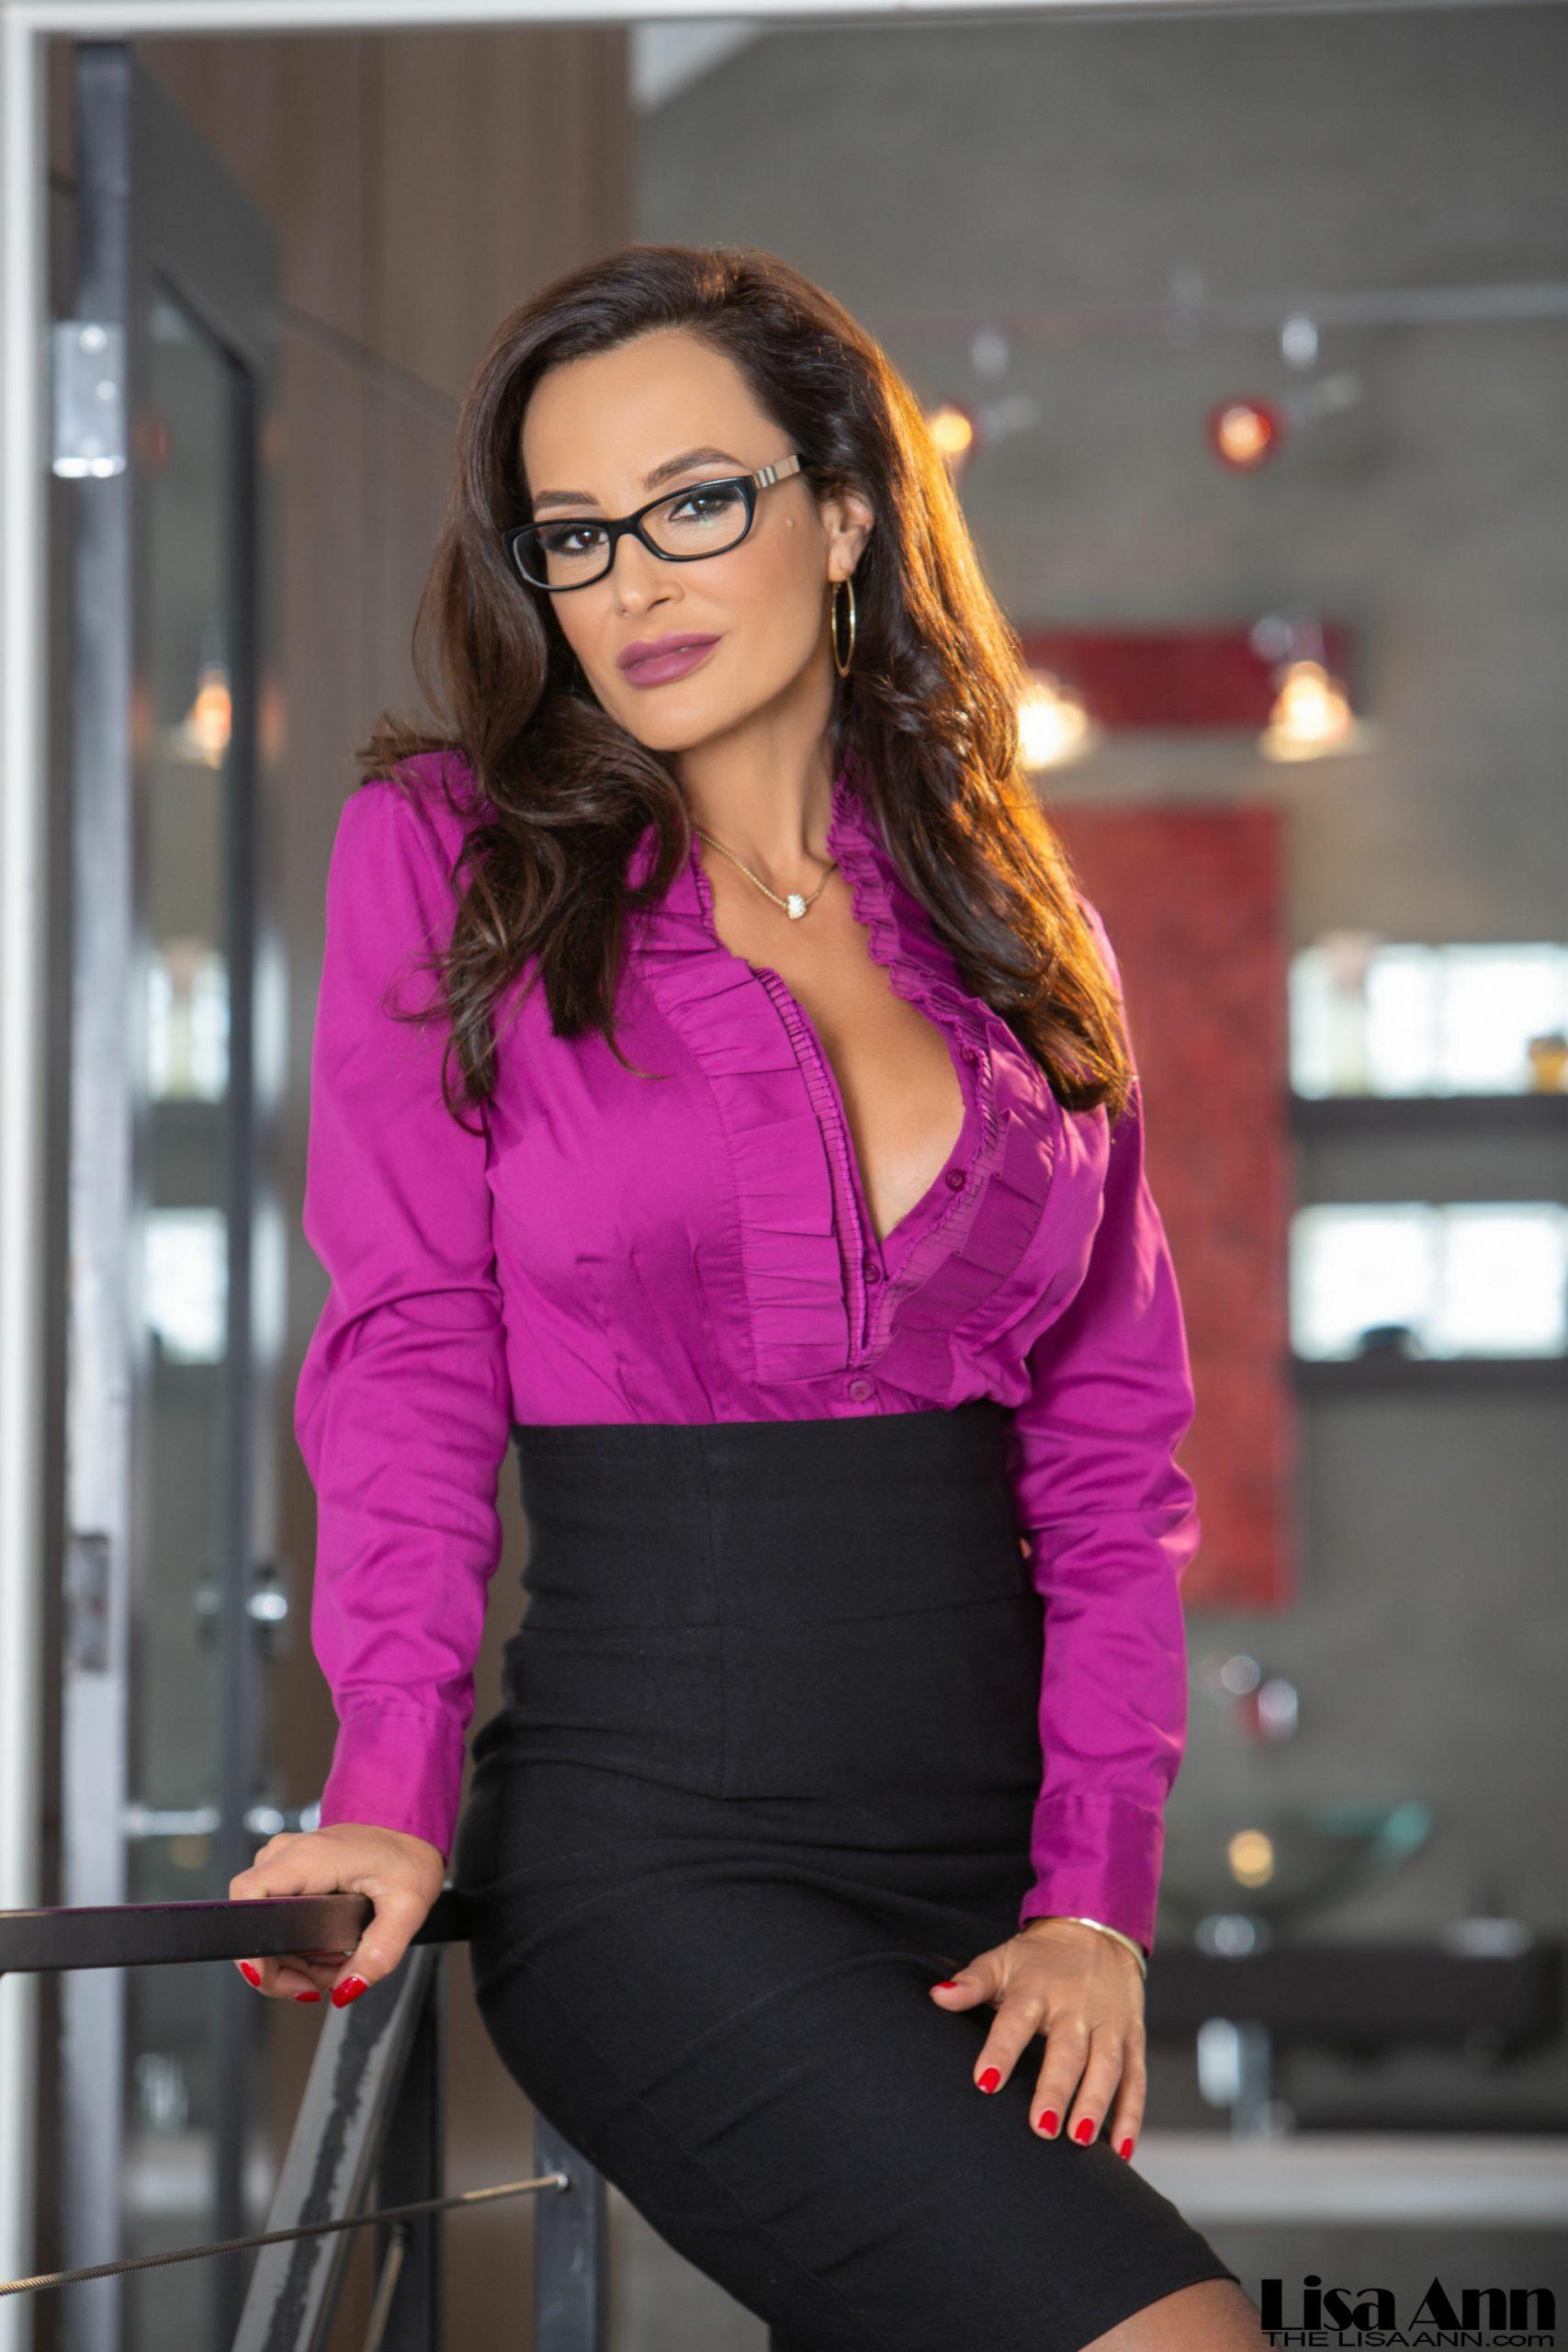 Lisa Ann Big Tit Tight Skirt Secretary